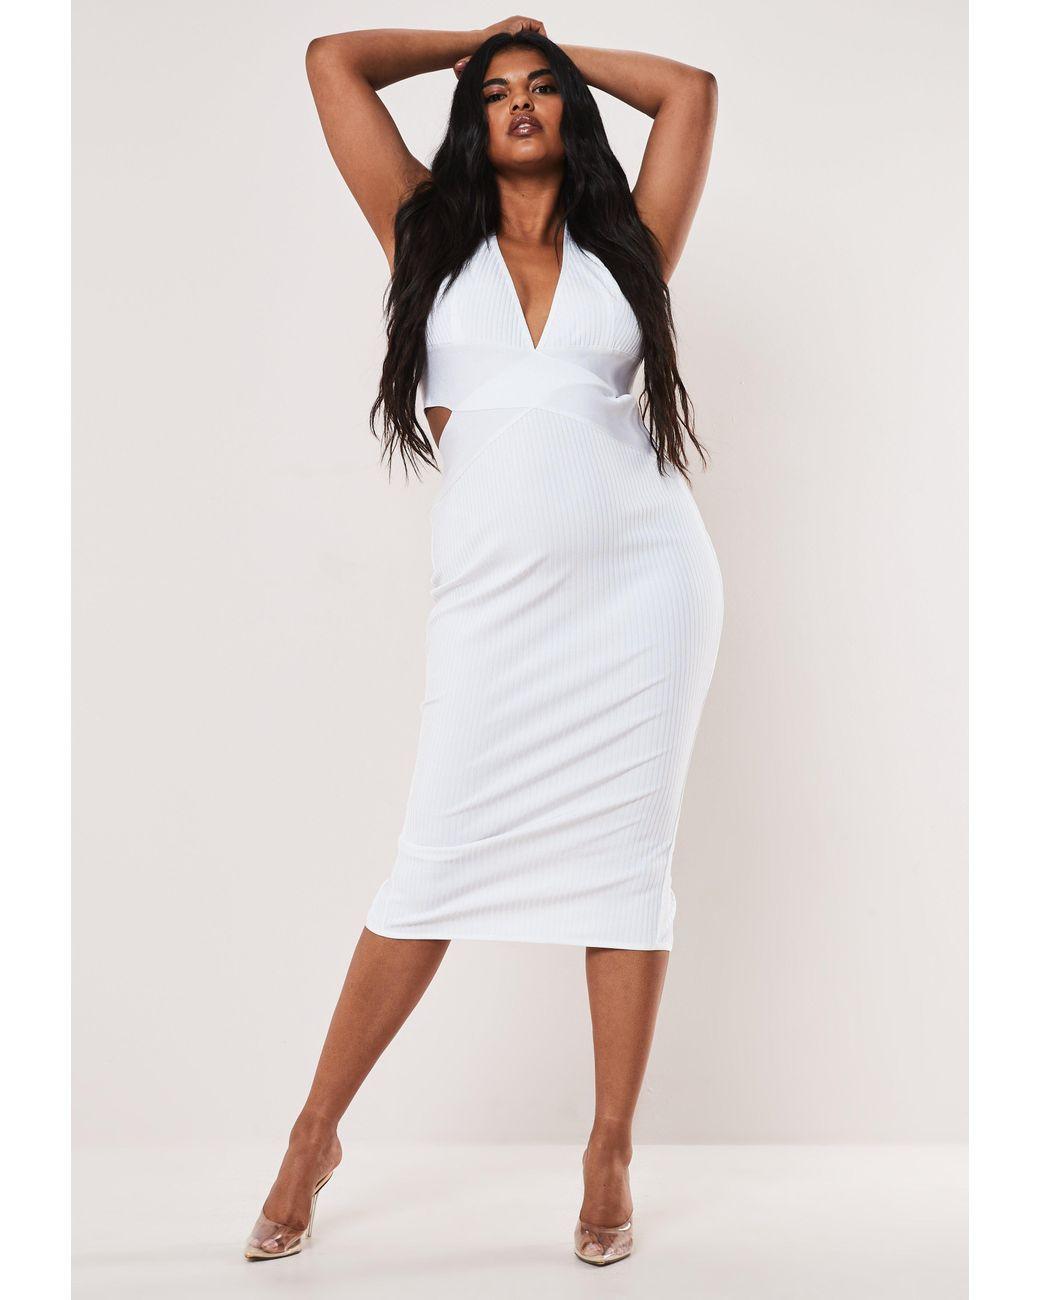 Women\'s Size White Halterneck Bandage Midaxi Dress